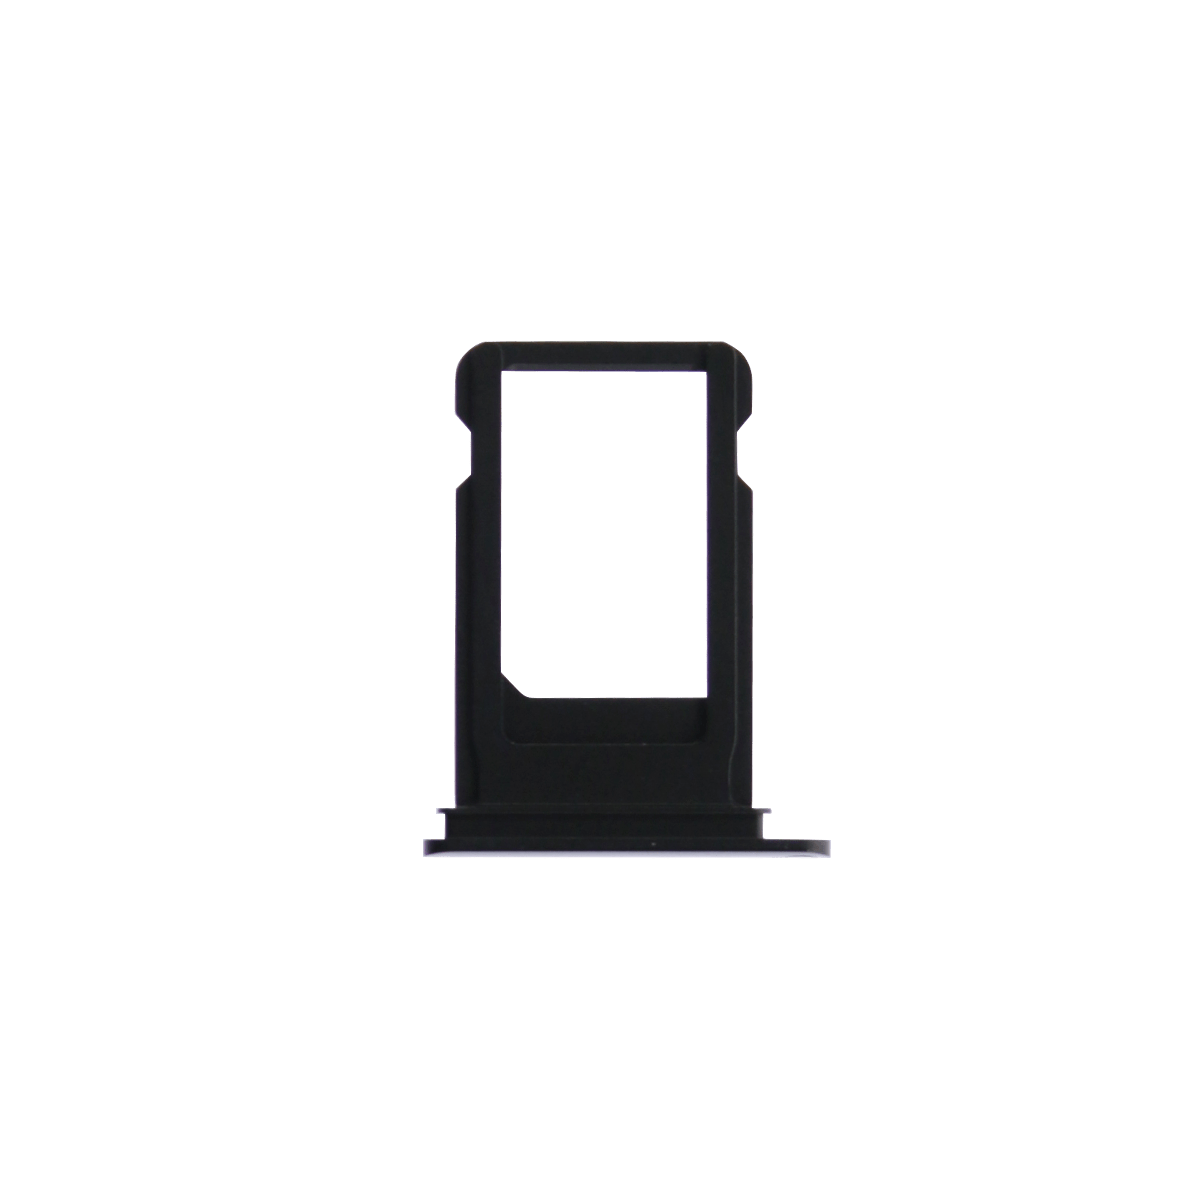 Iphone 7 Nano Sim Card Tray